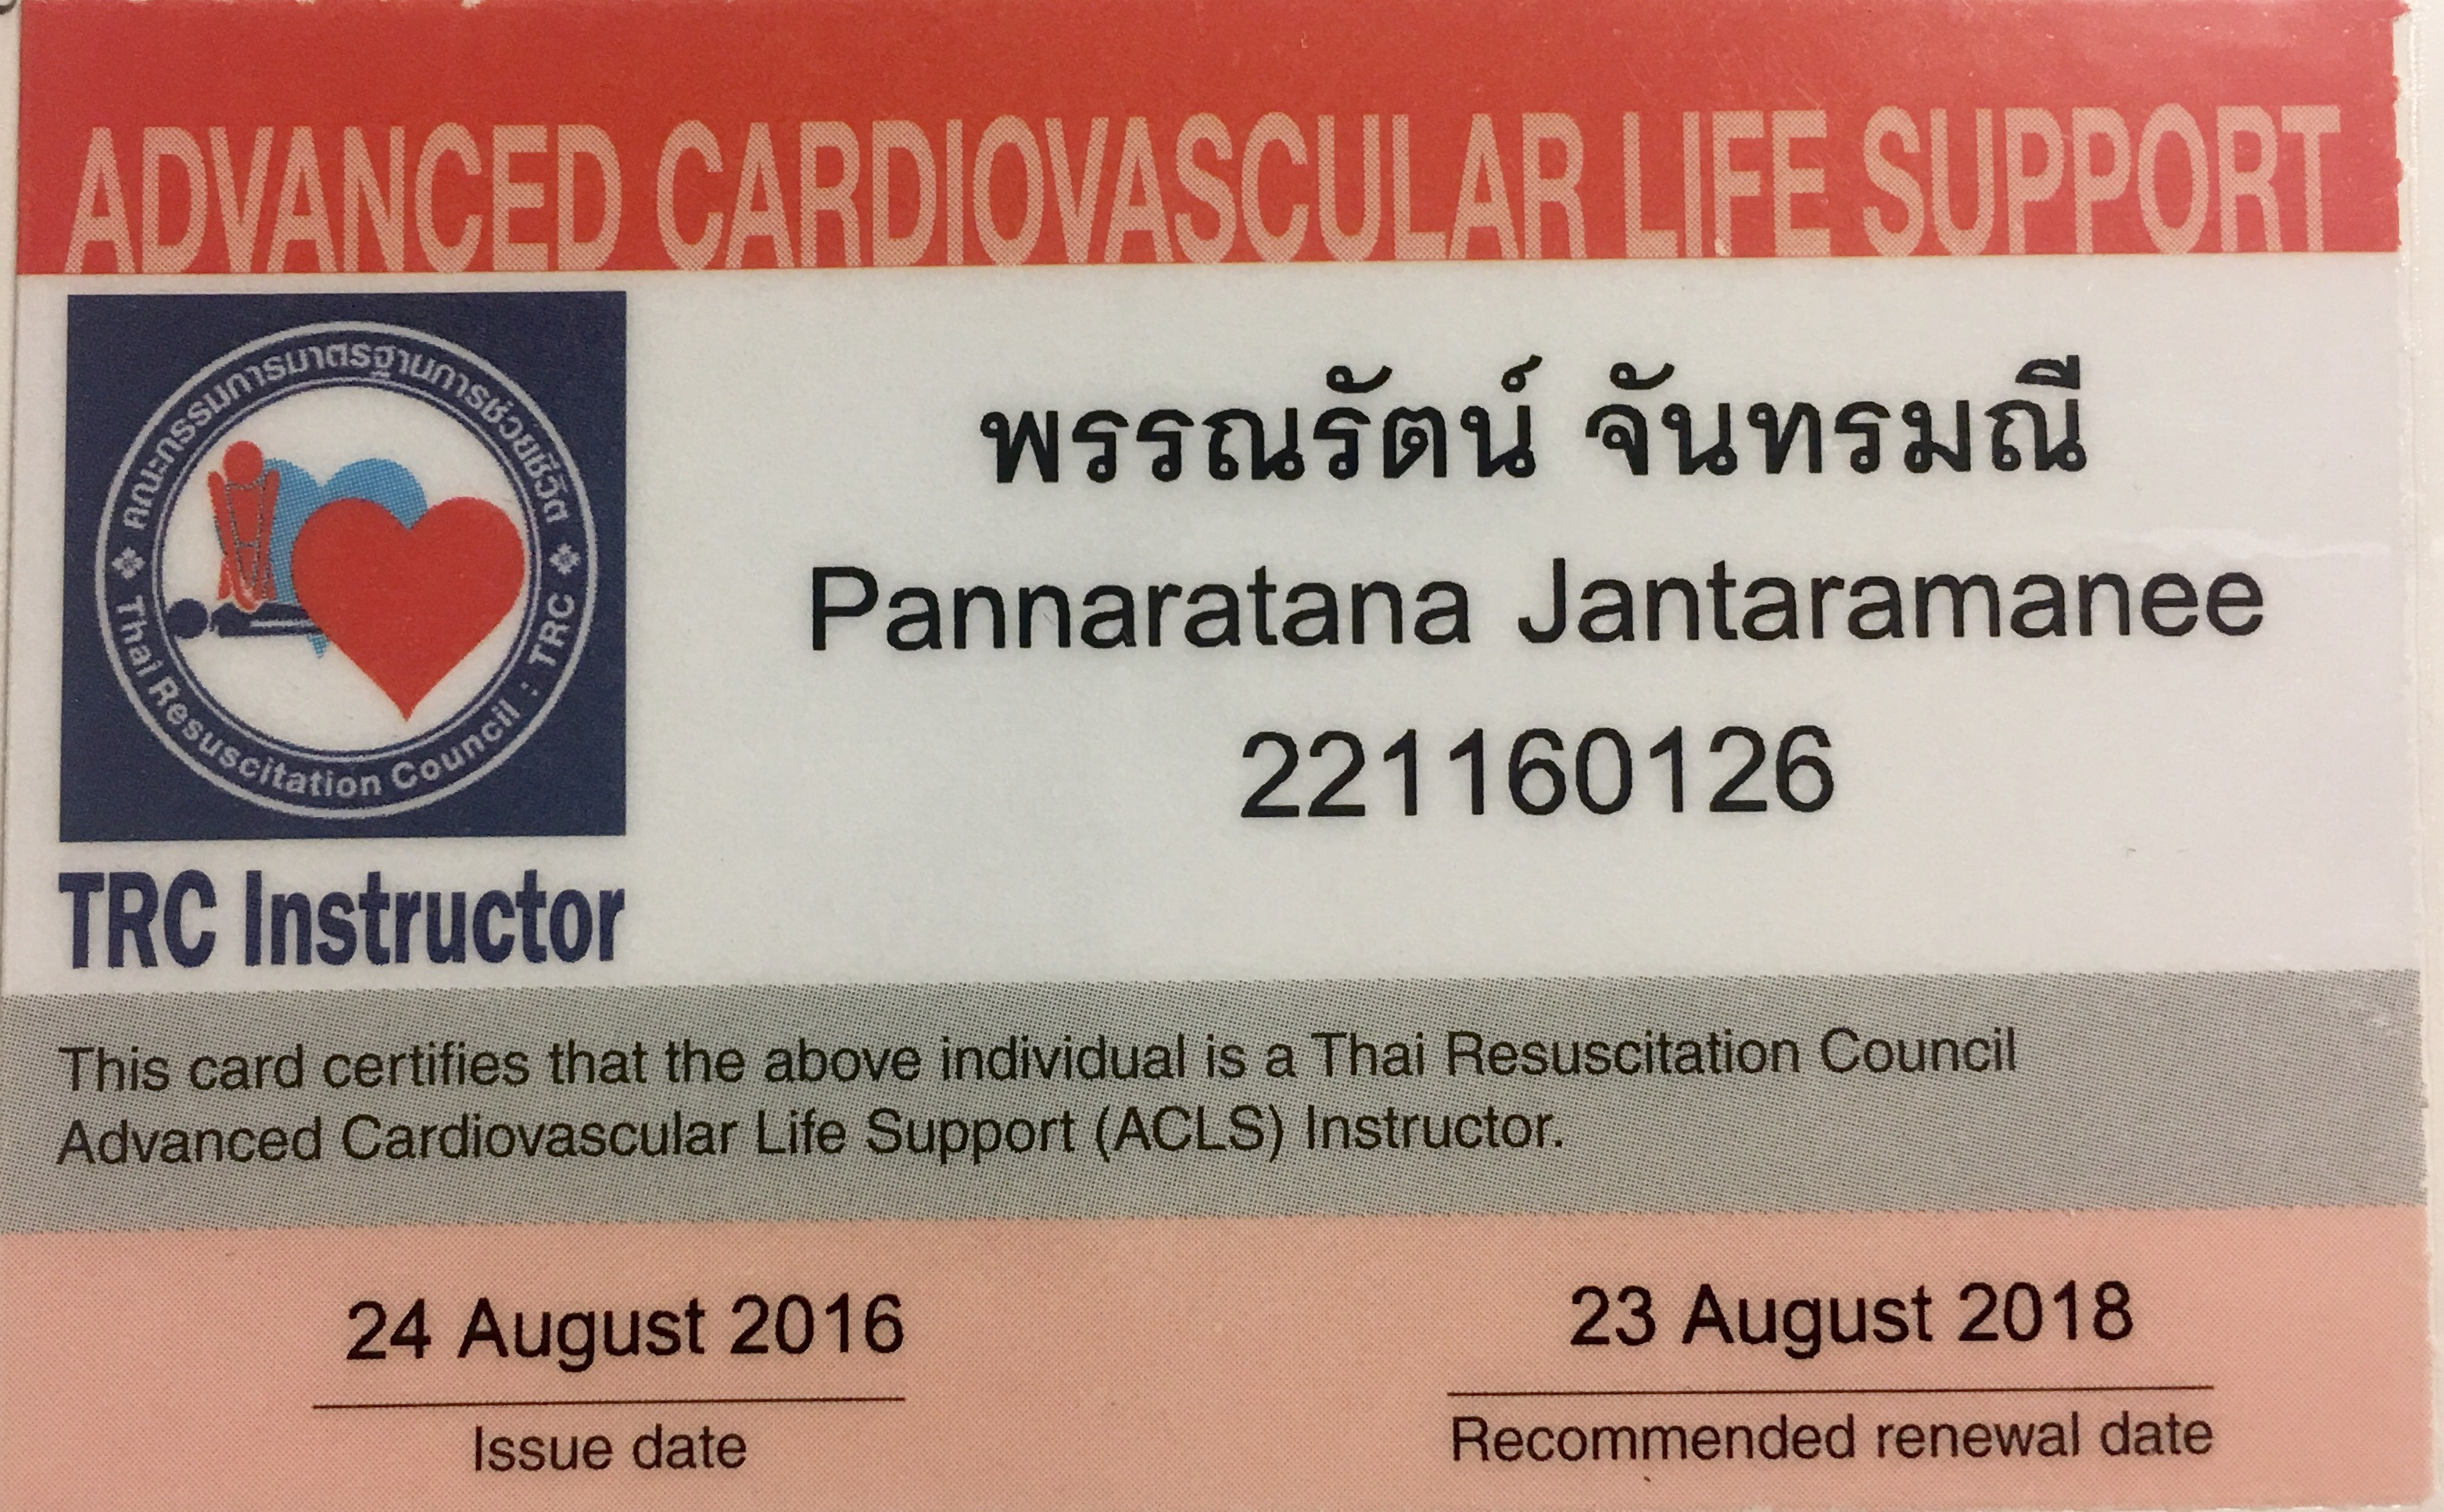 Pannaratana jantaramanee bayt acls instructor certificate xflitez Gallery